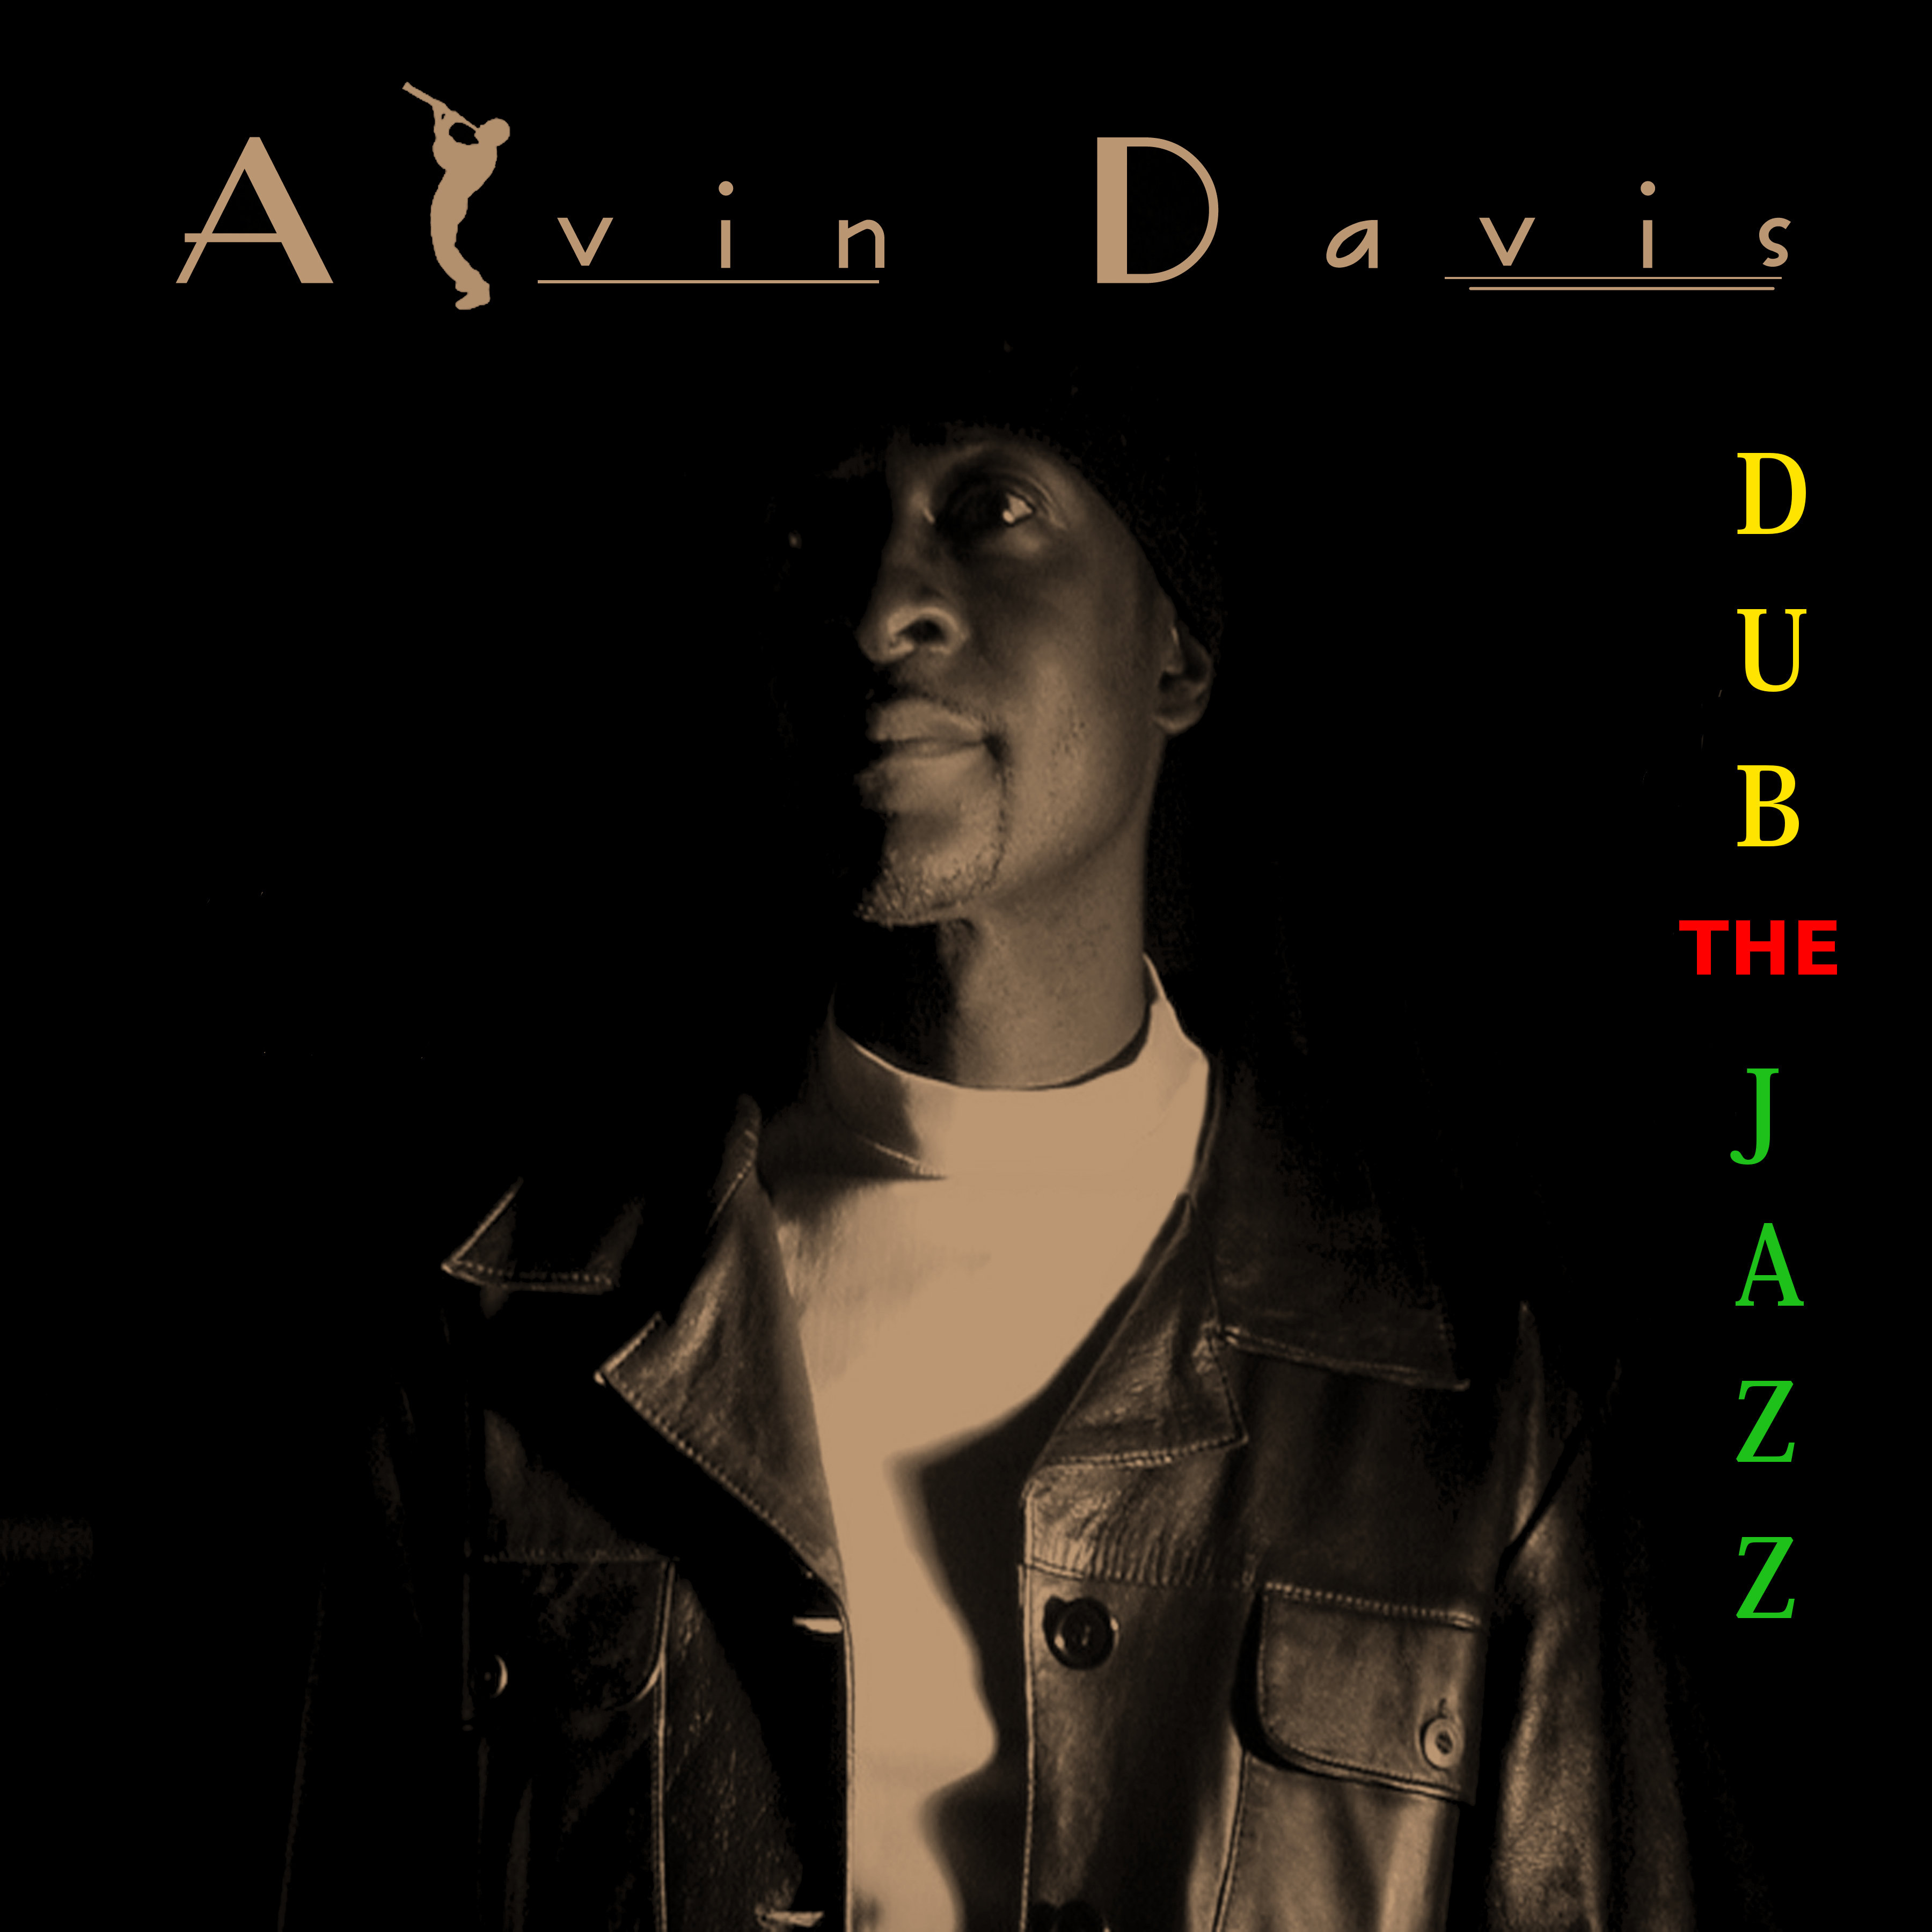 Dub The Jazz - CD 00000